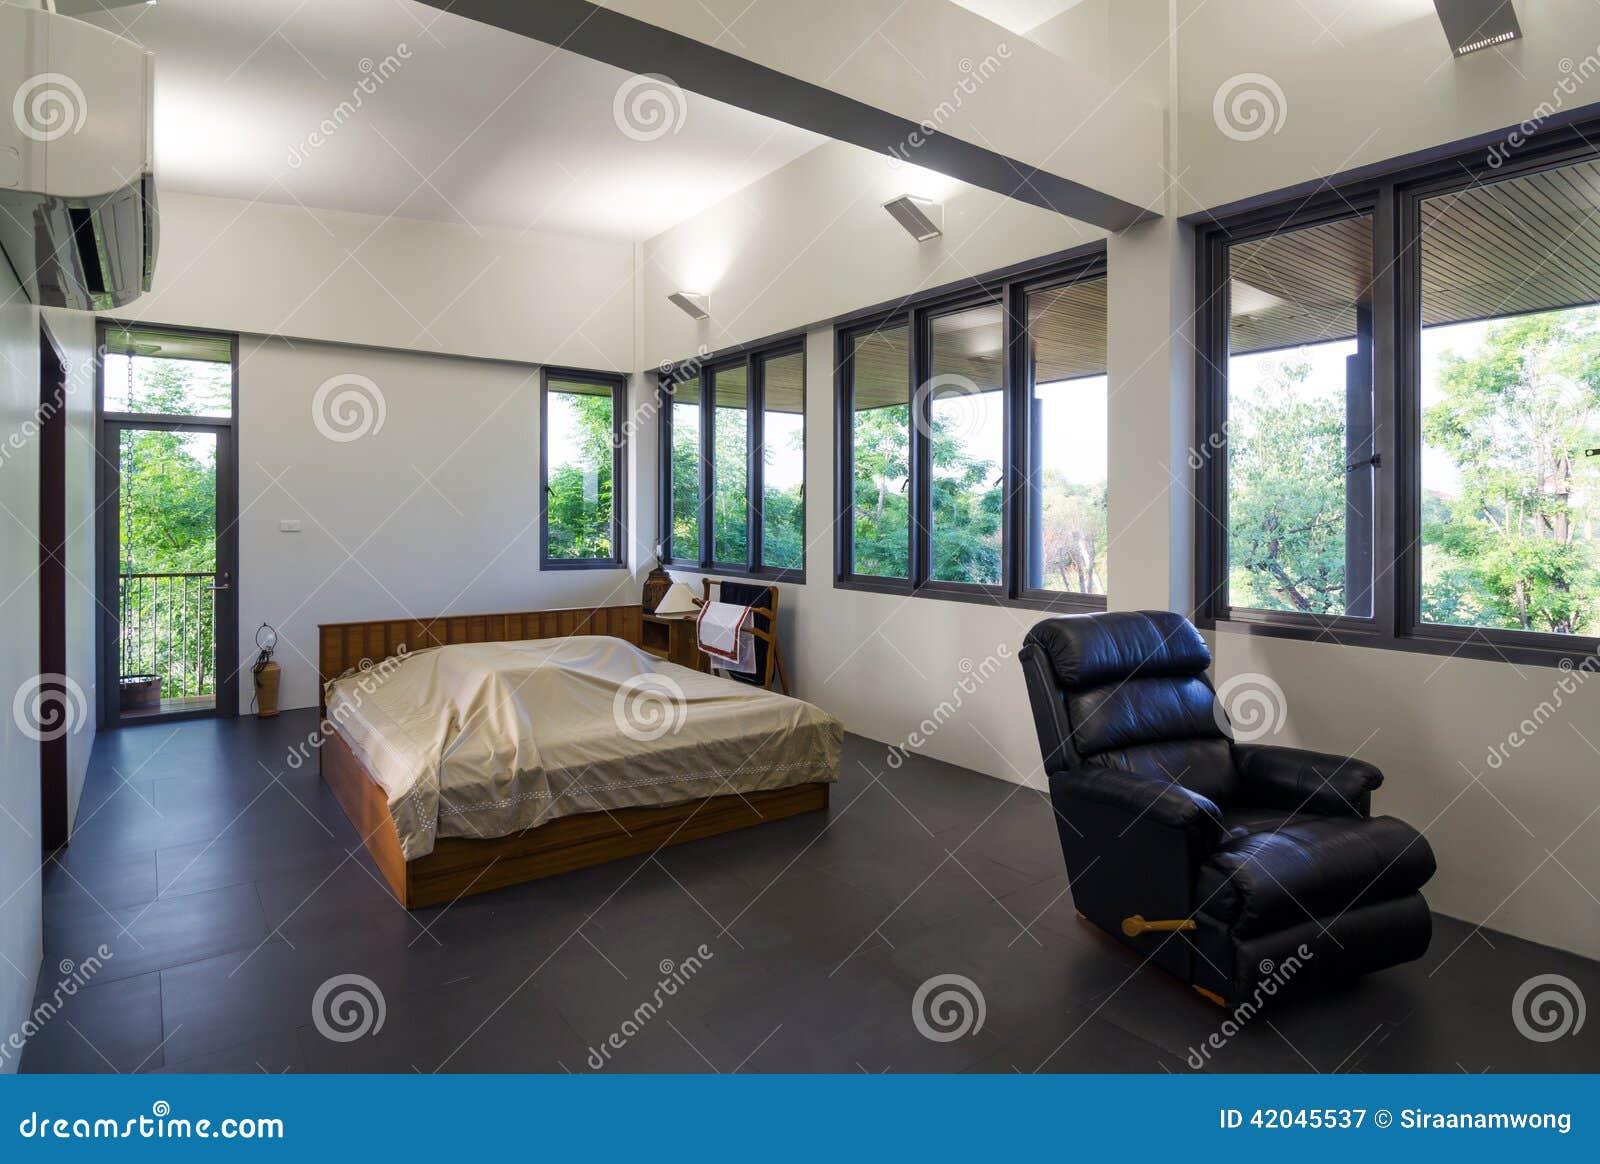 Download Modern bedroom interior stock image. Image of comfortable - 42045537